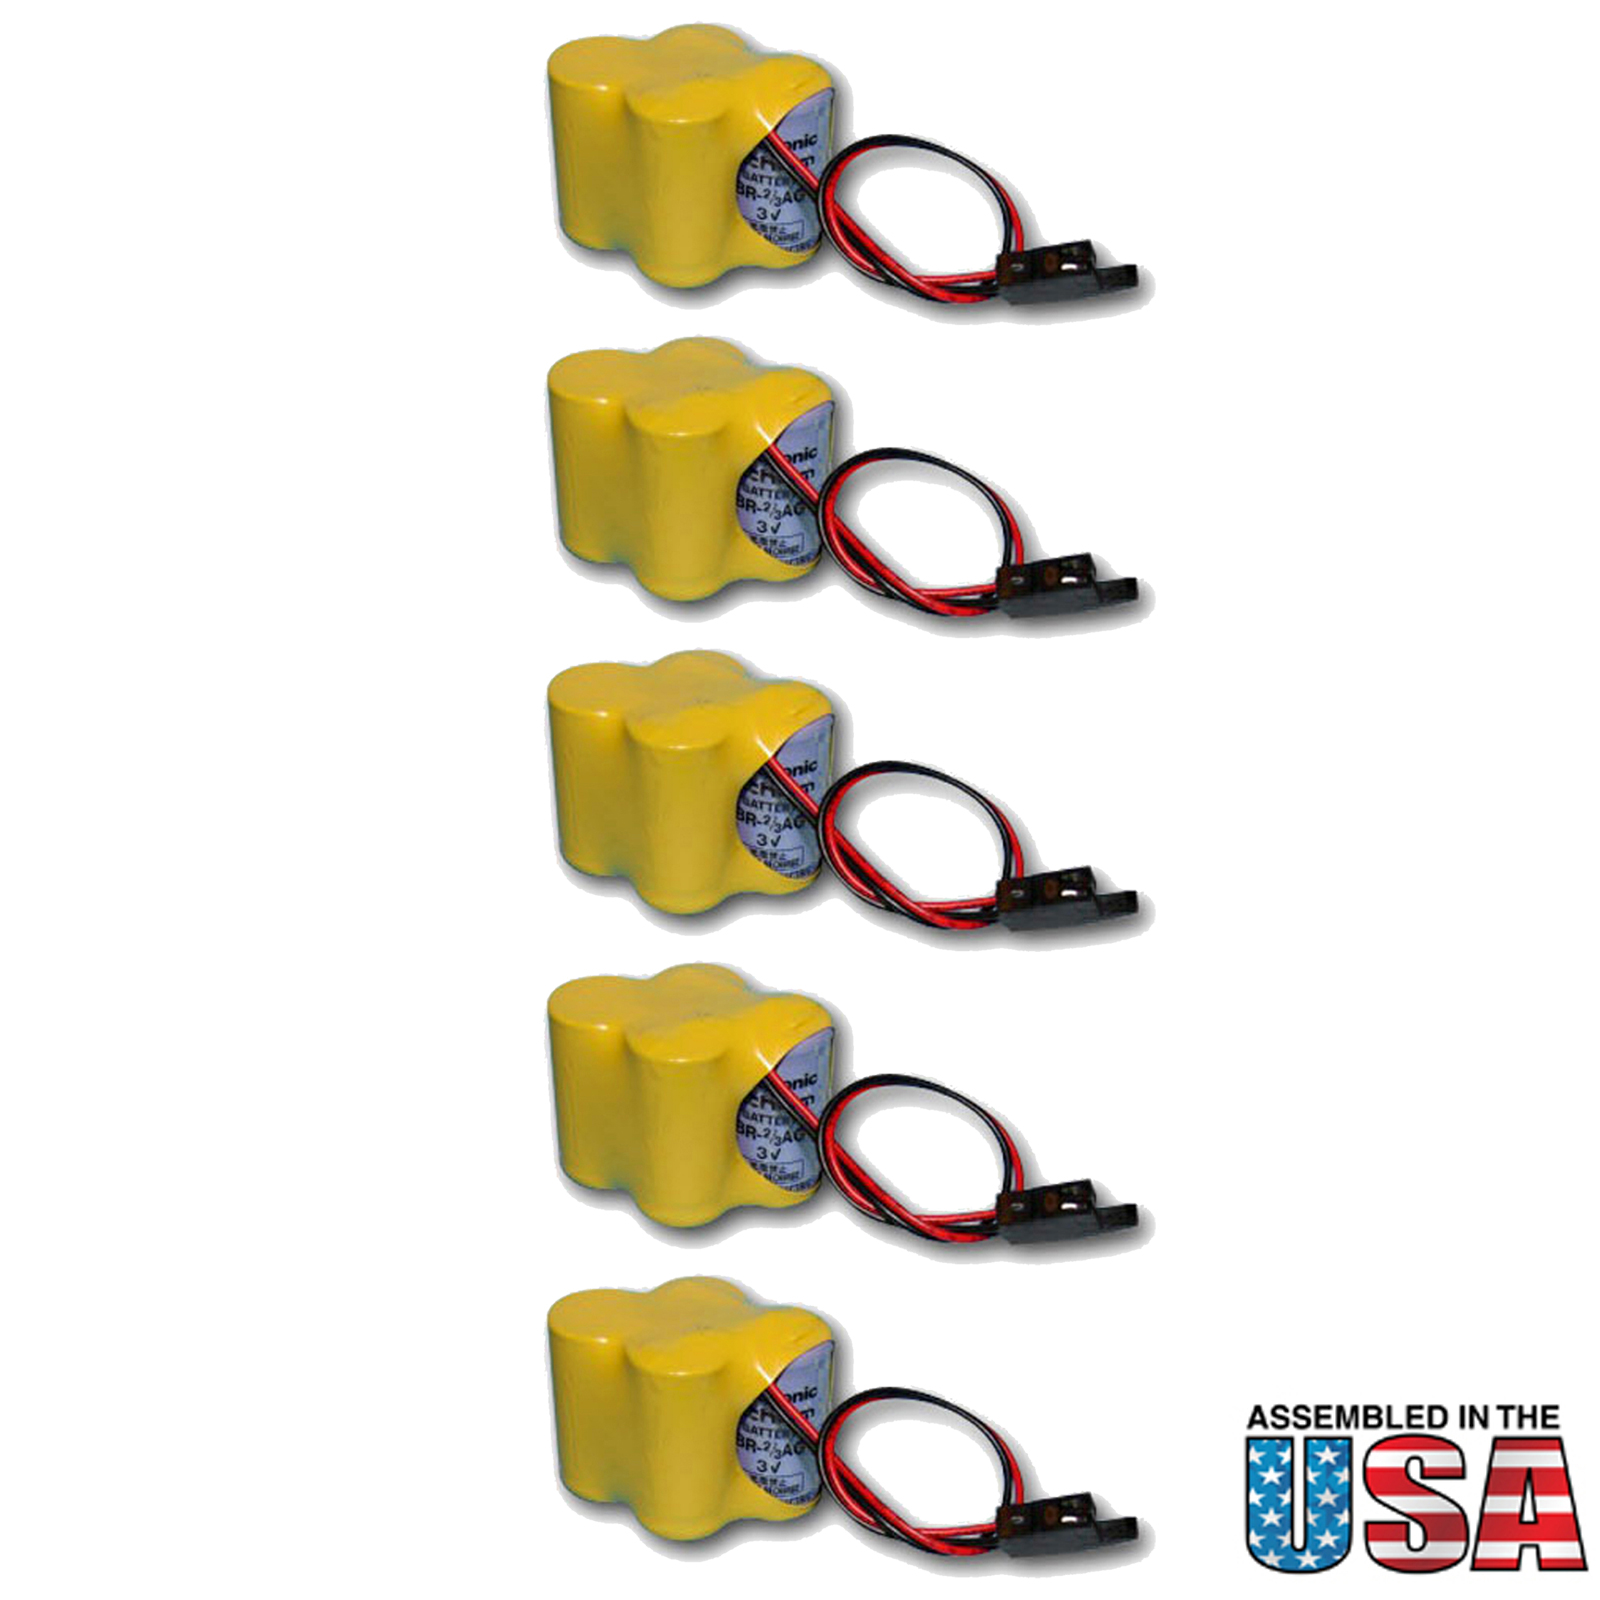 5pc PLC Backup Battery Replaces Interstate ALIT0138 LIT0138 FAST USA SHIP